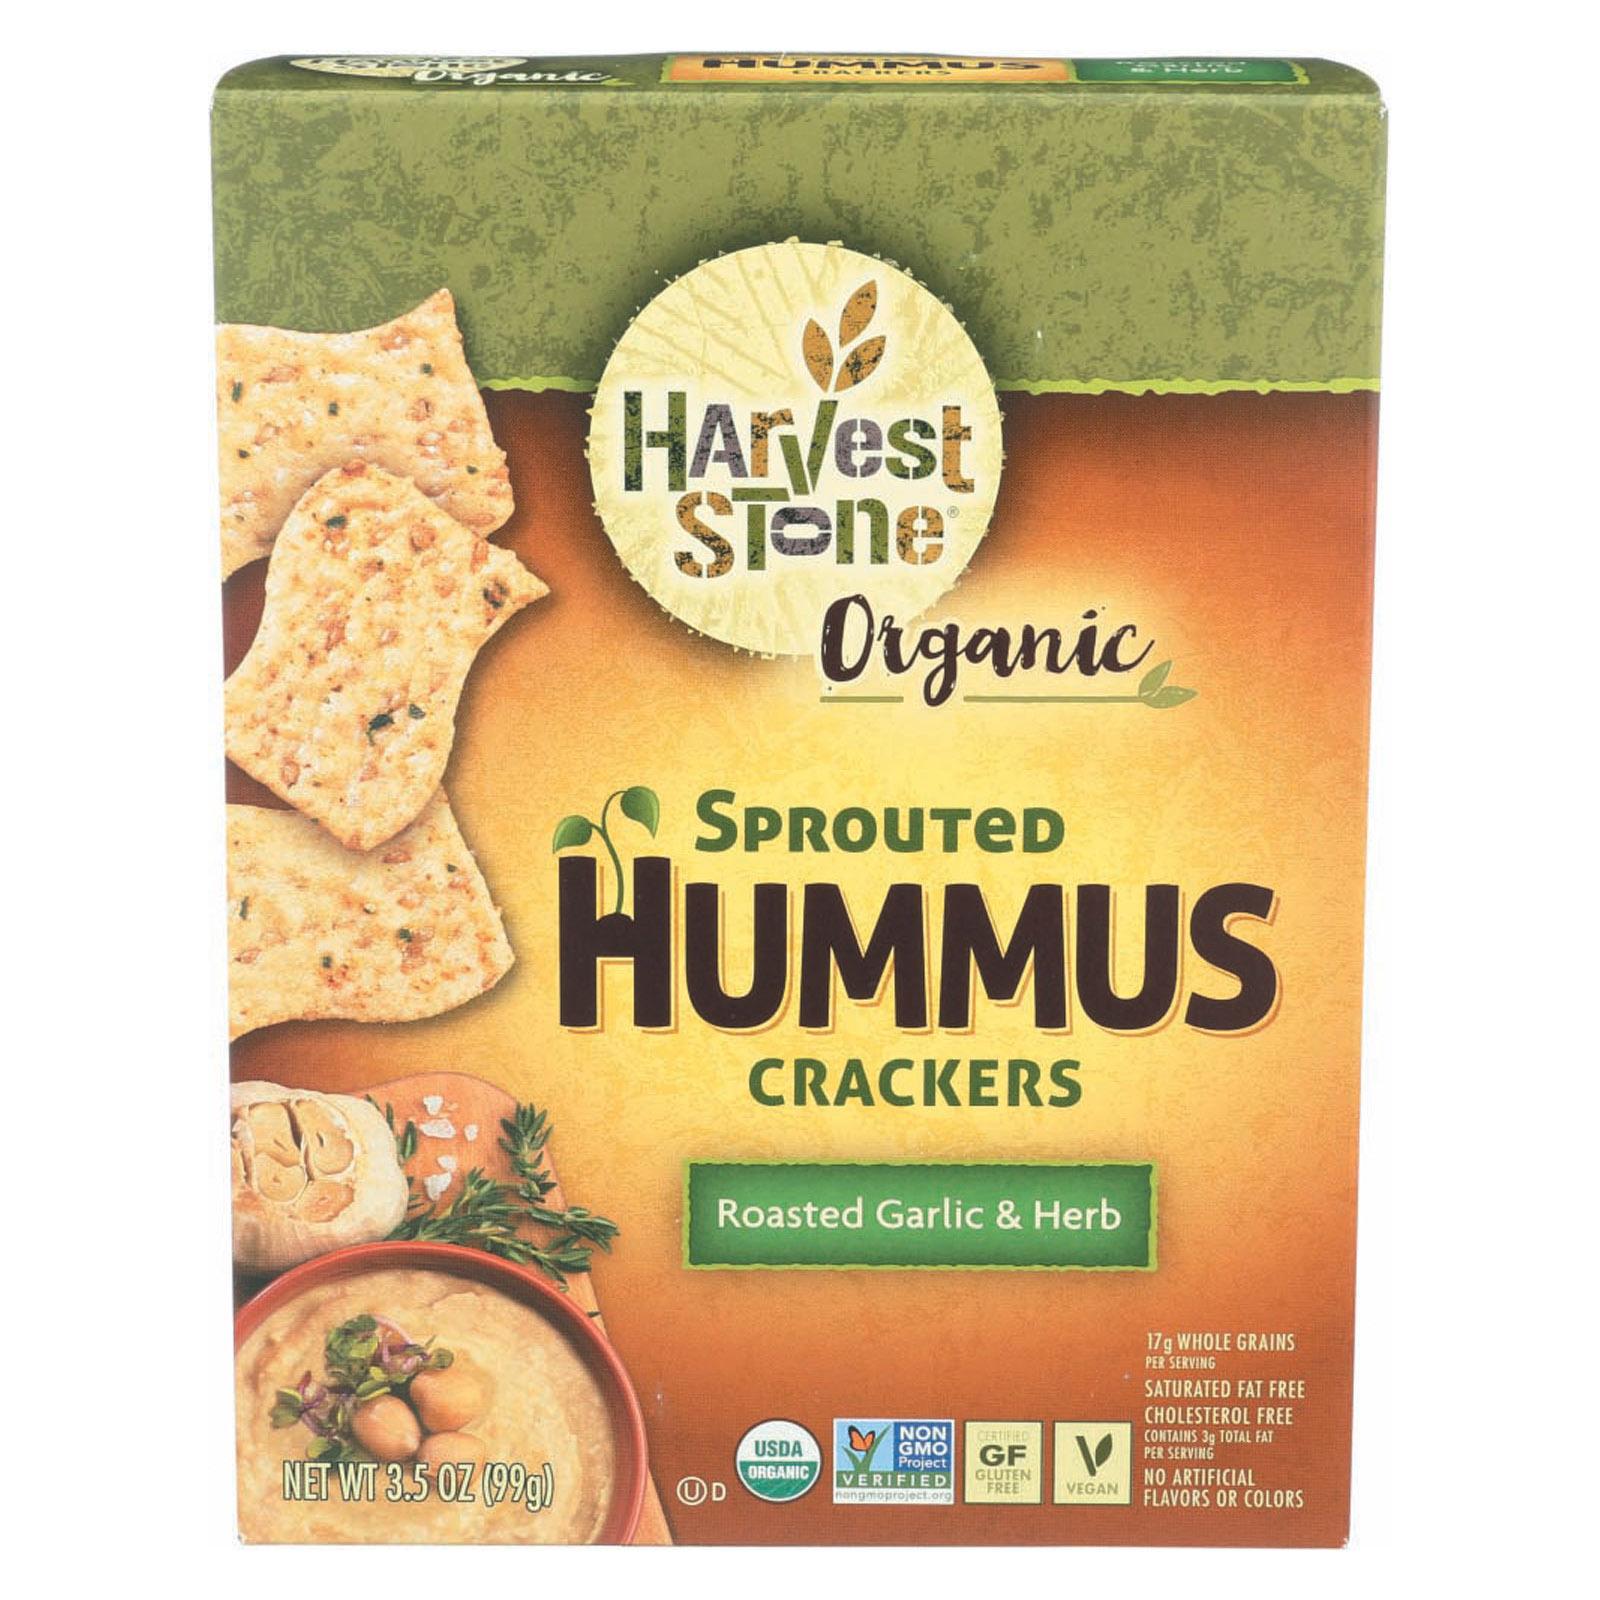 Harvest Stone Organic Hummus Crackers - Roasted Garlic & Herb - Case of 6 - 3.5 oz